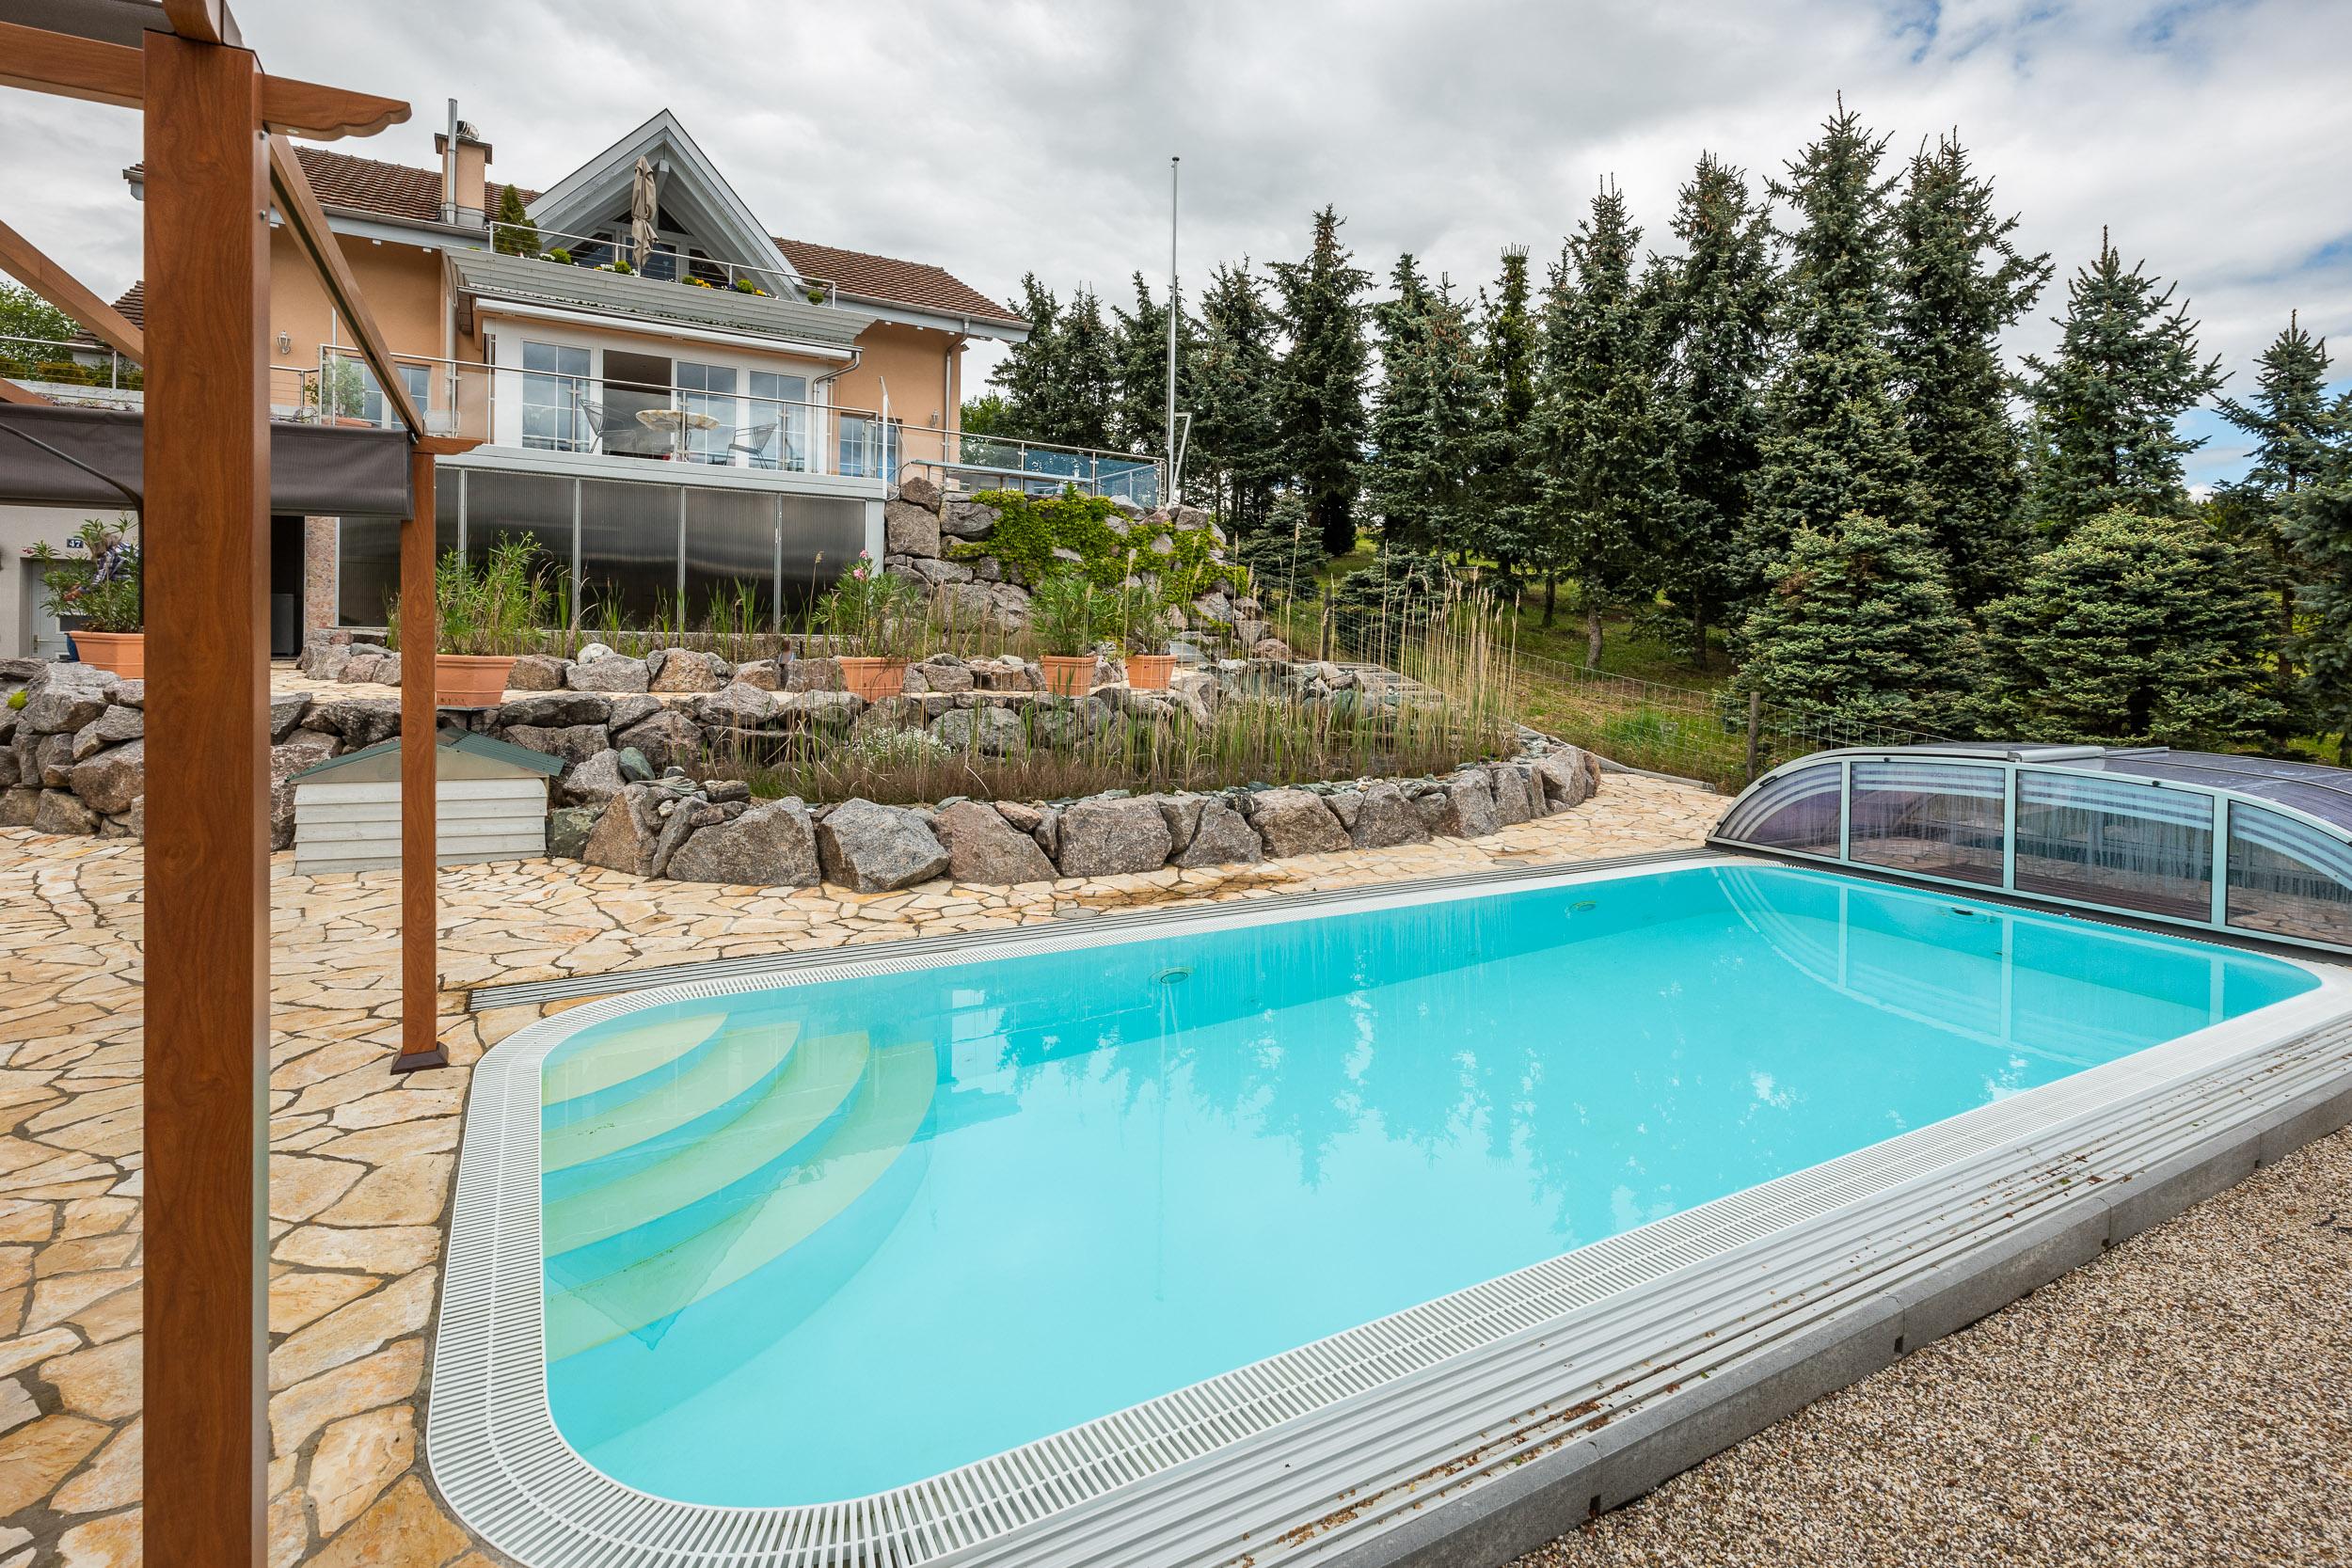 Abdeckbarer Swimmingpool. Im Pool kann man sich auch bei geschlossenem Dach aufhalten